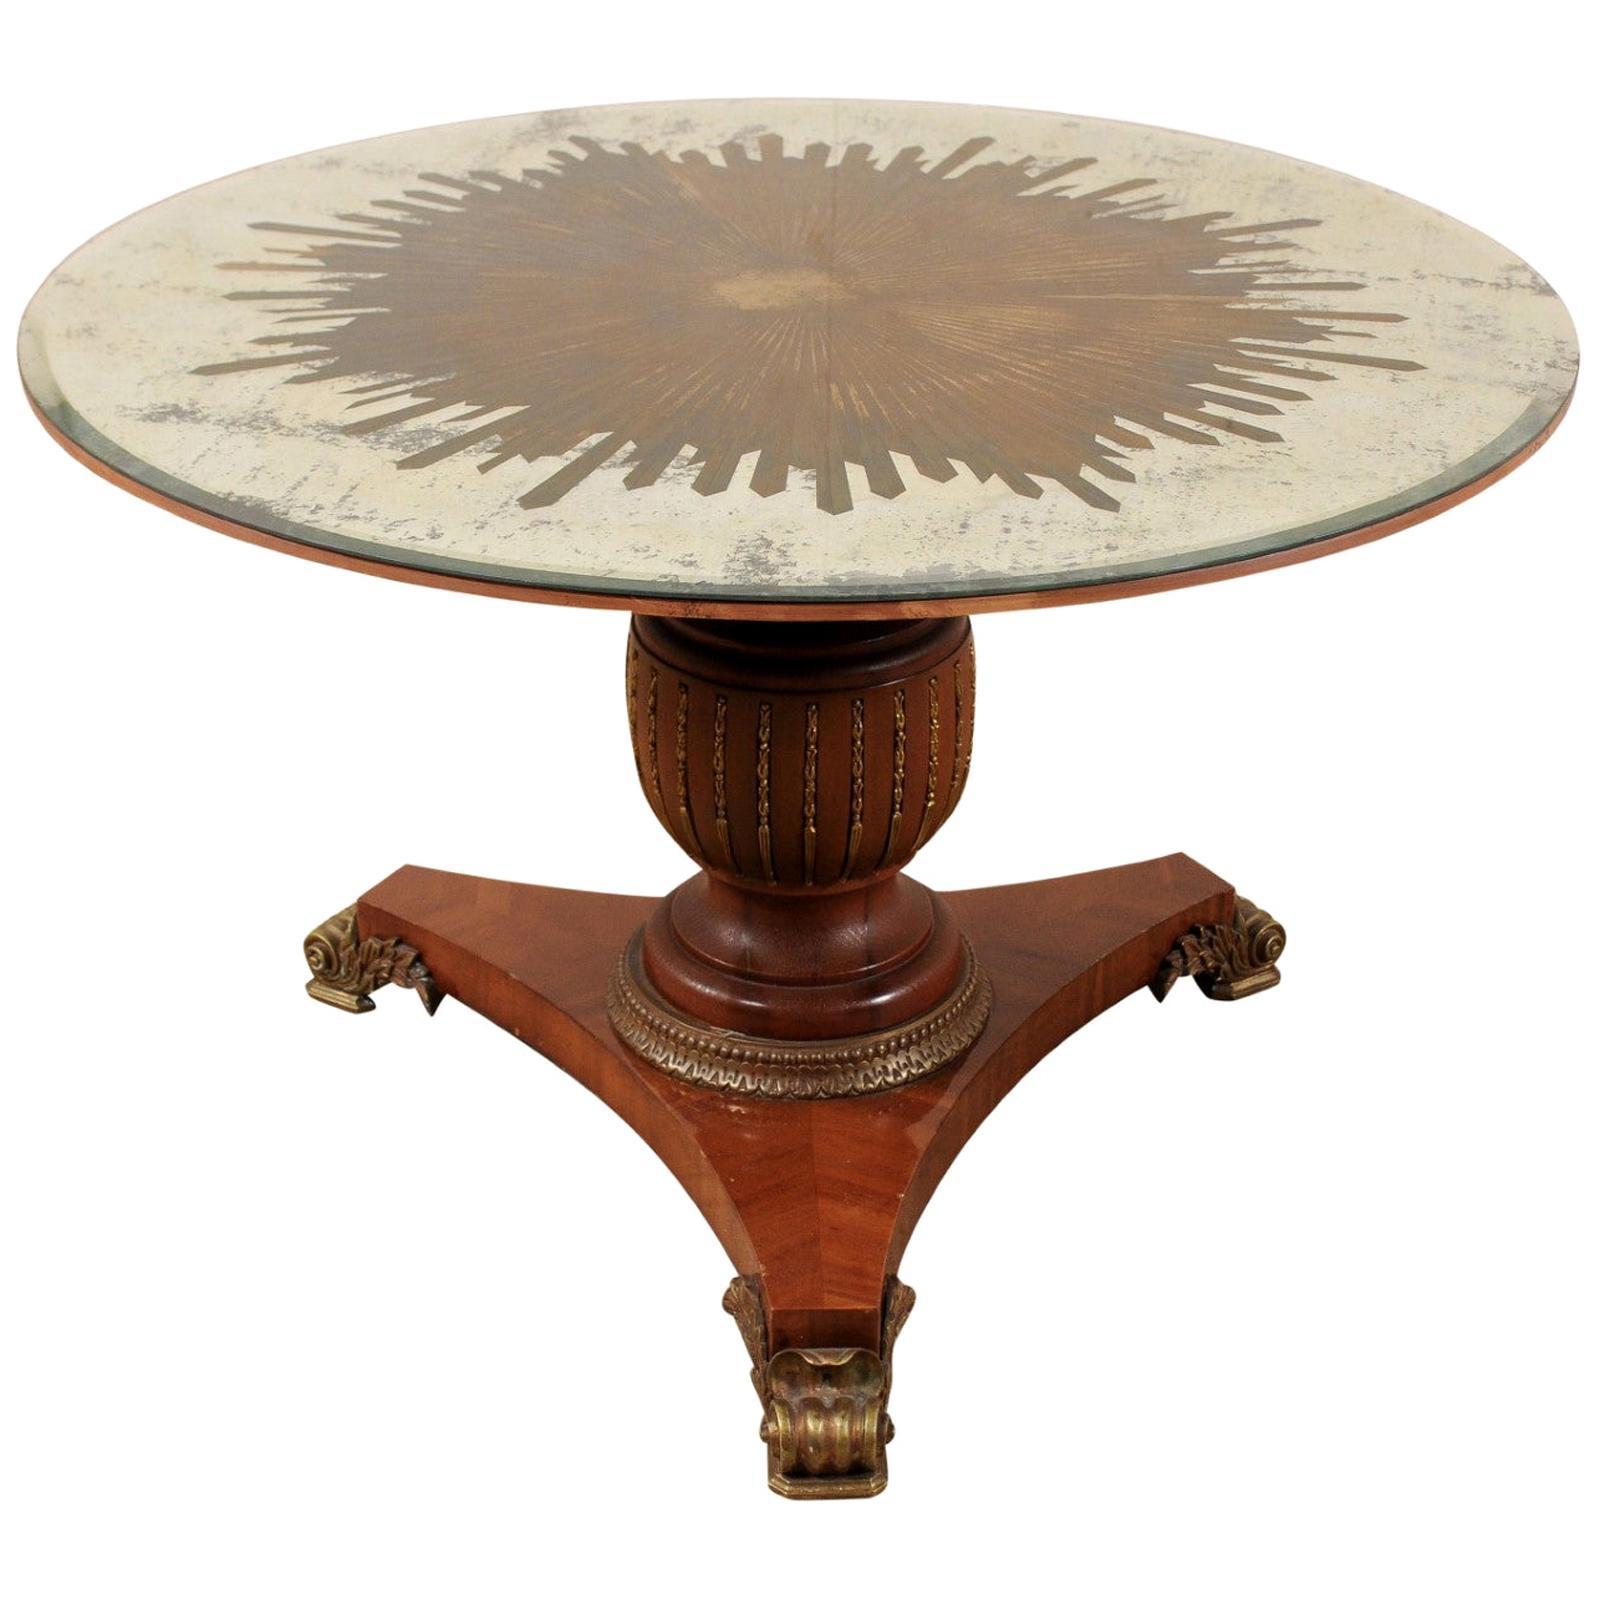 Custom Table with Verre Églomisé Sunburst Mirror Top over Carved Pedestal Base